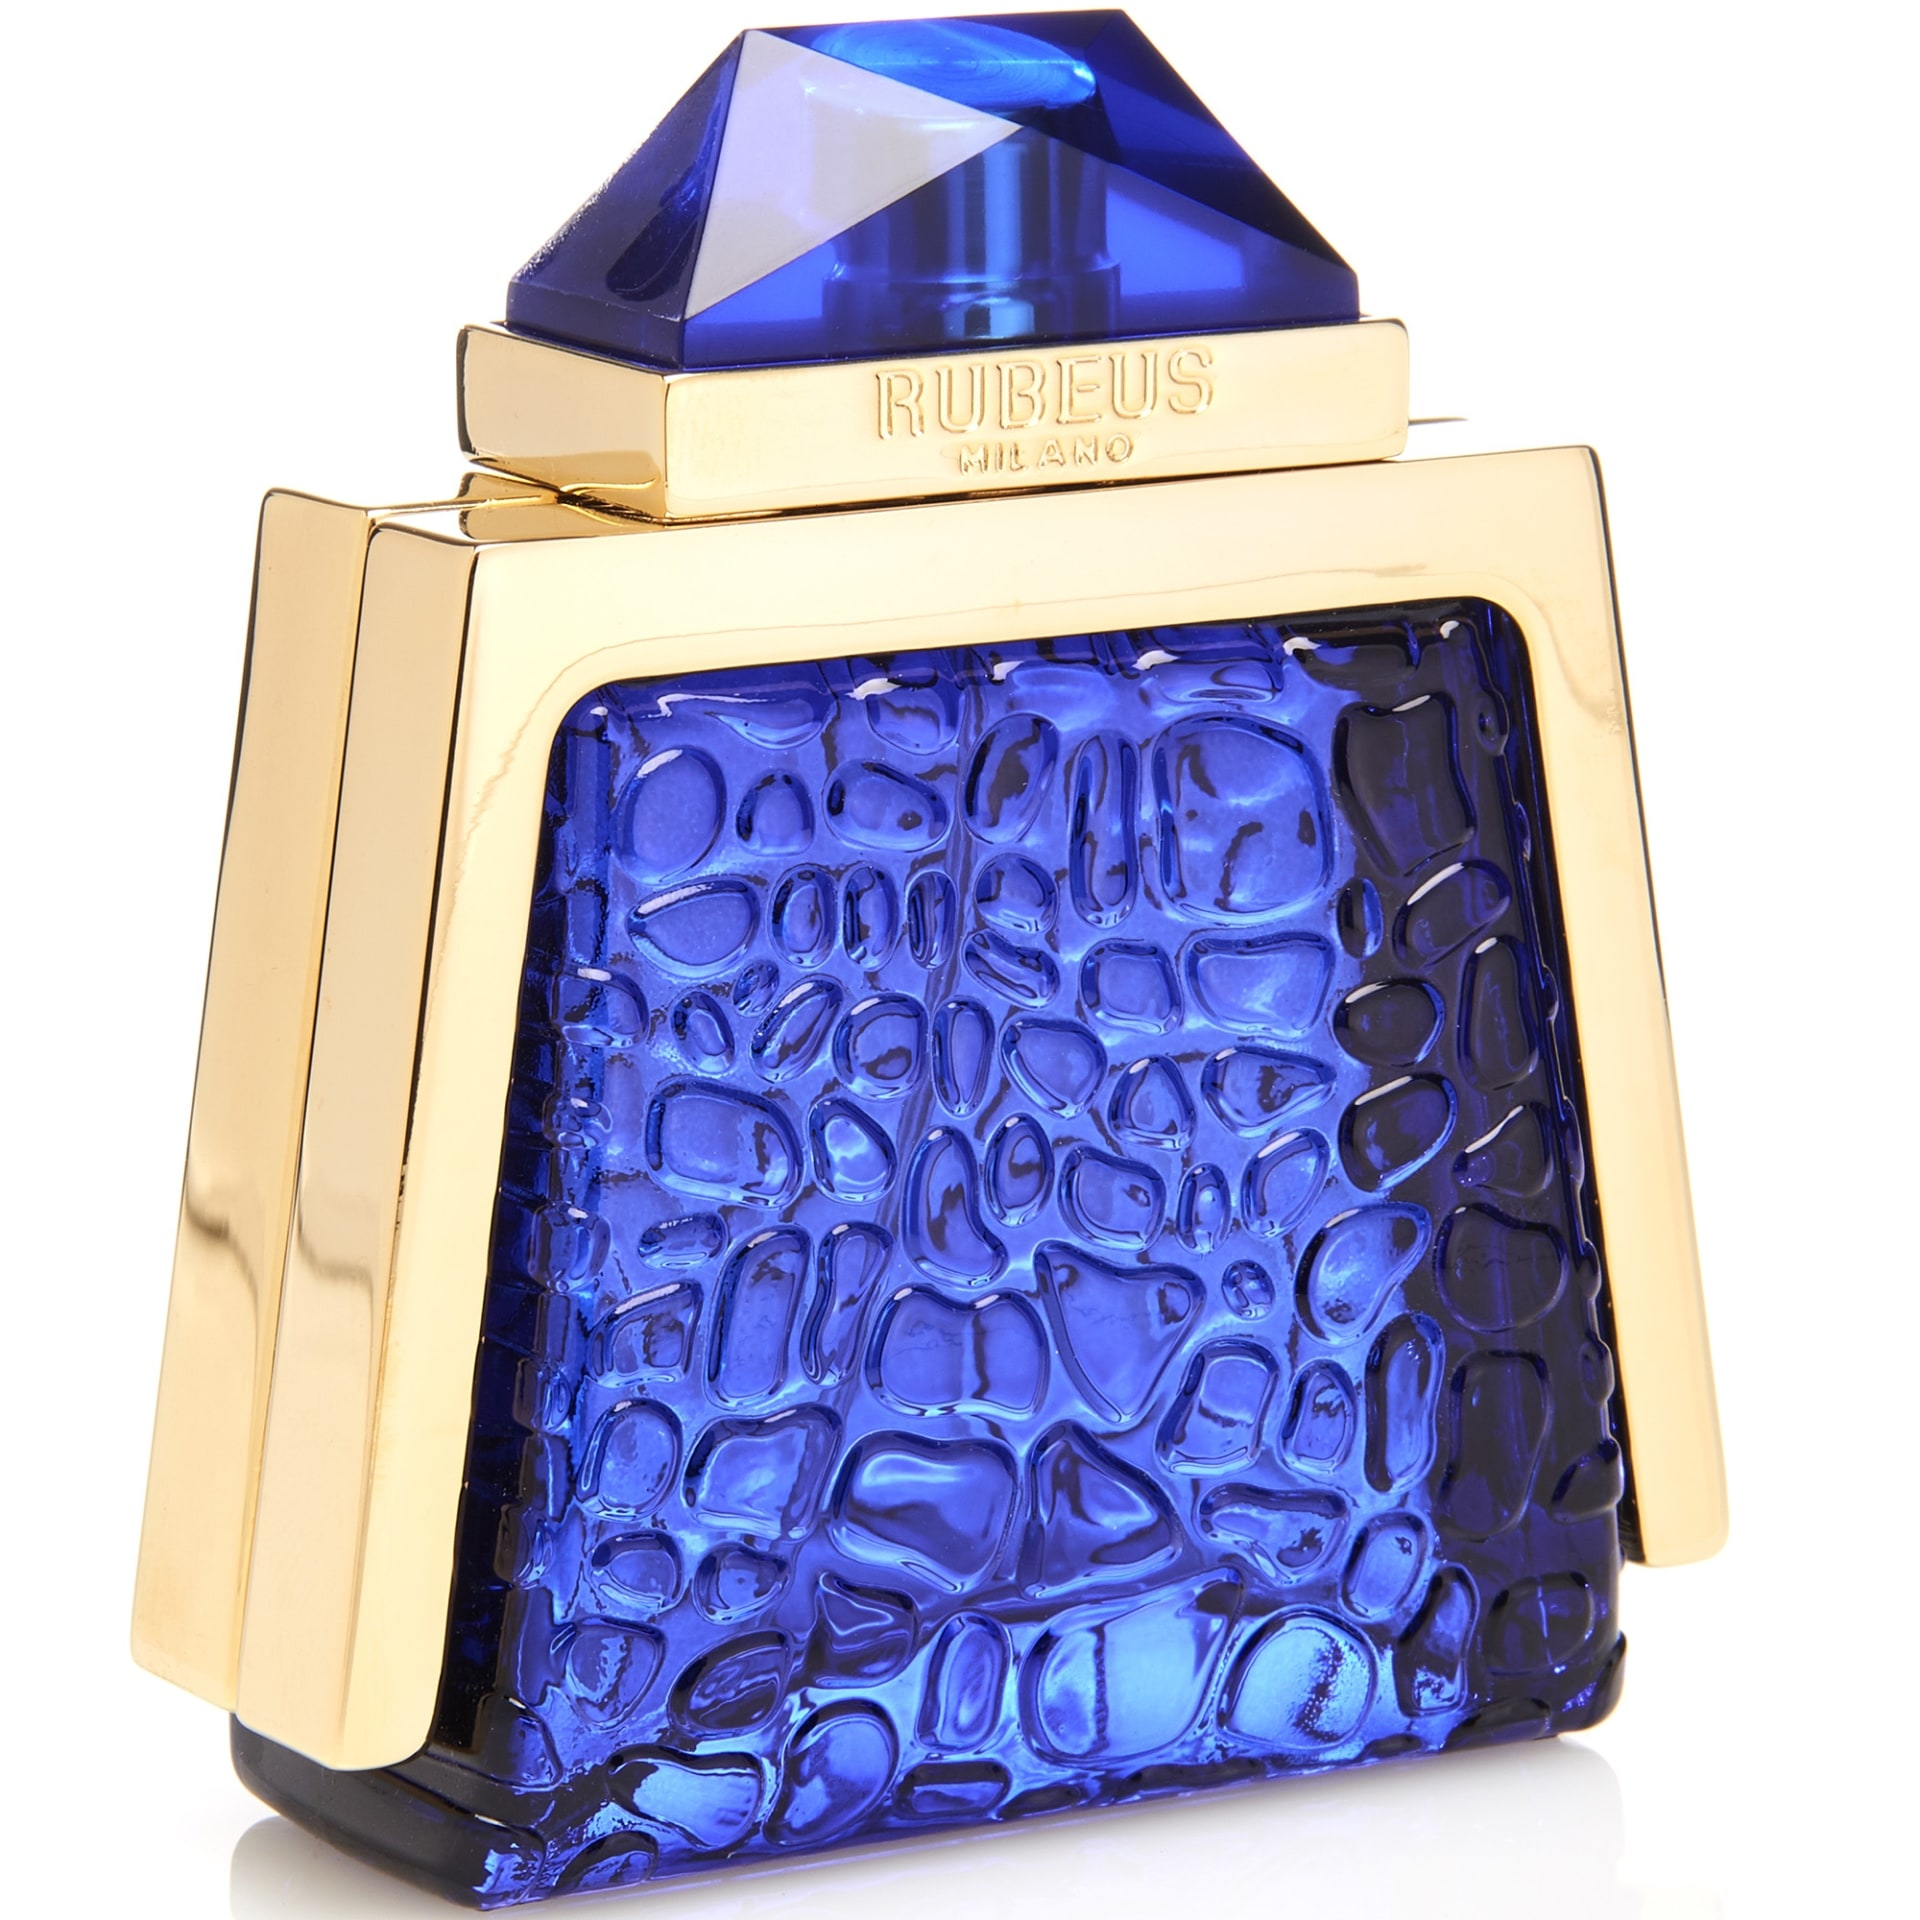 rubeus-milano-bleu-1